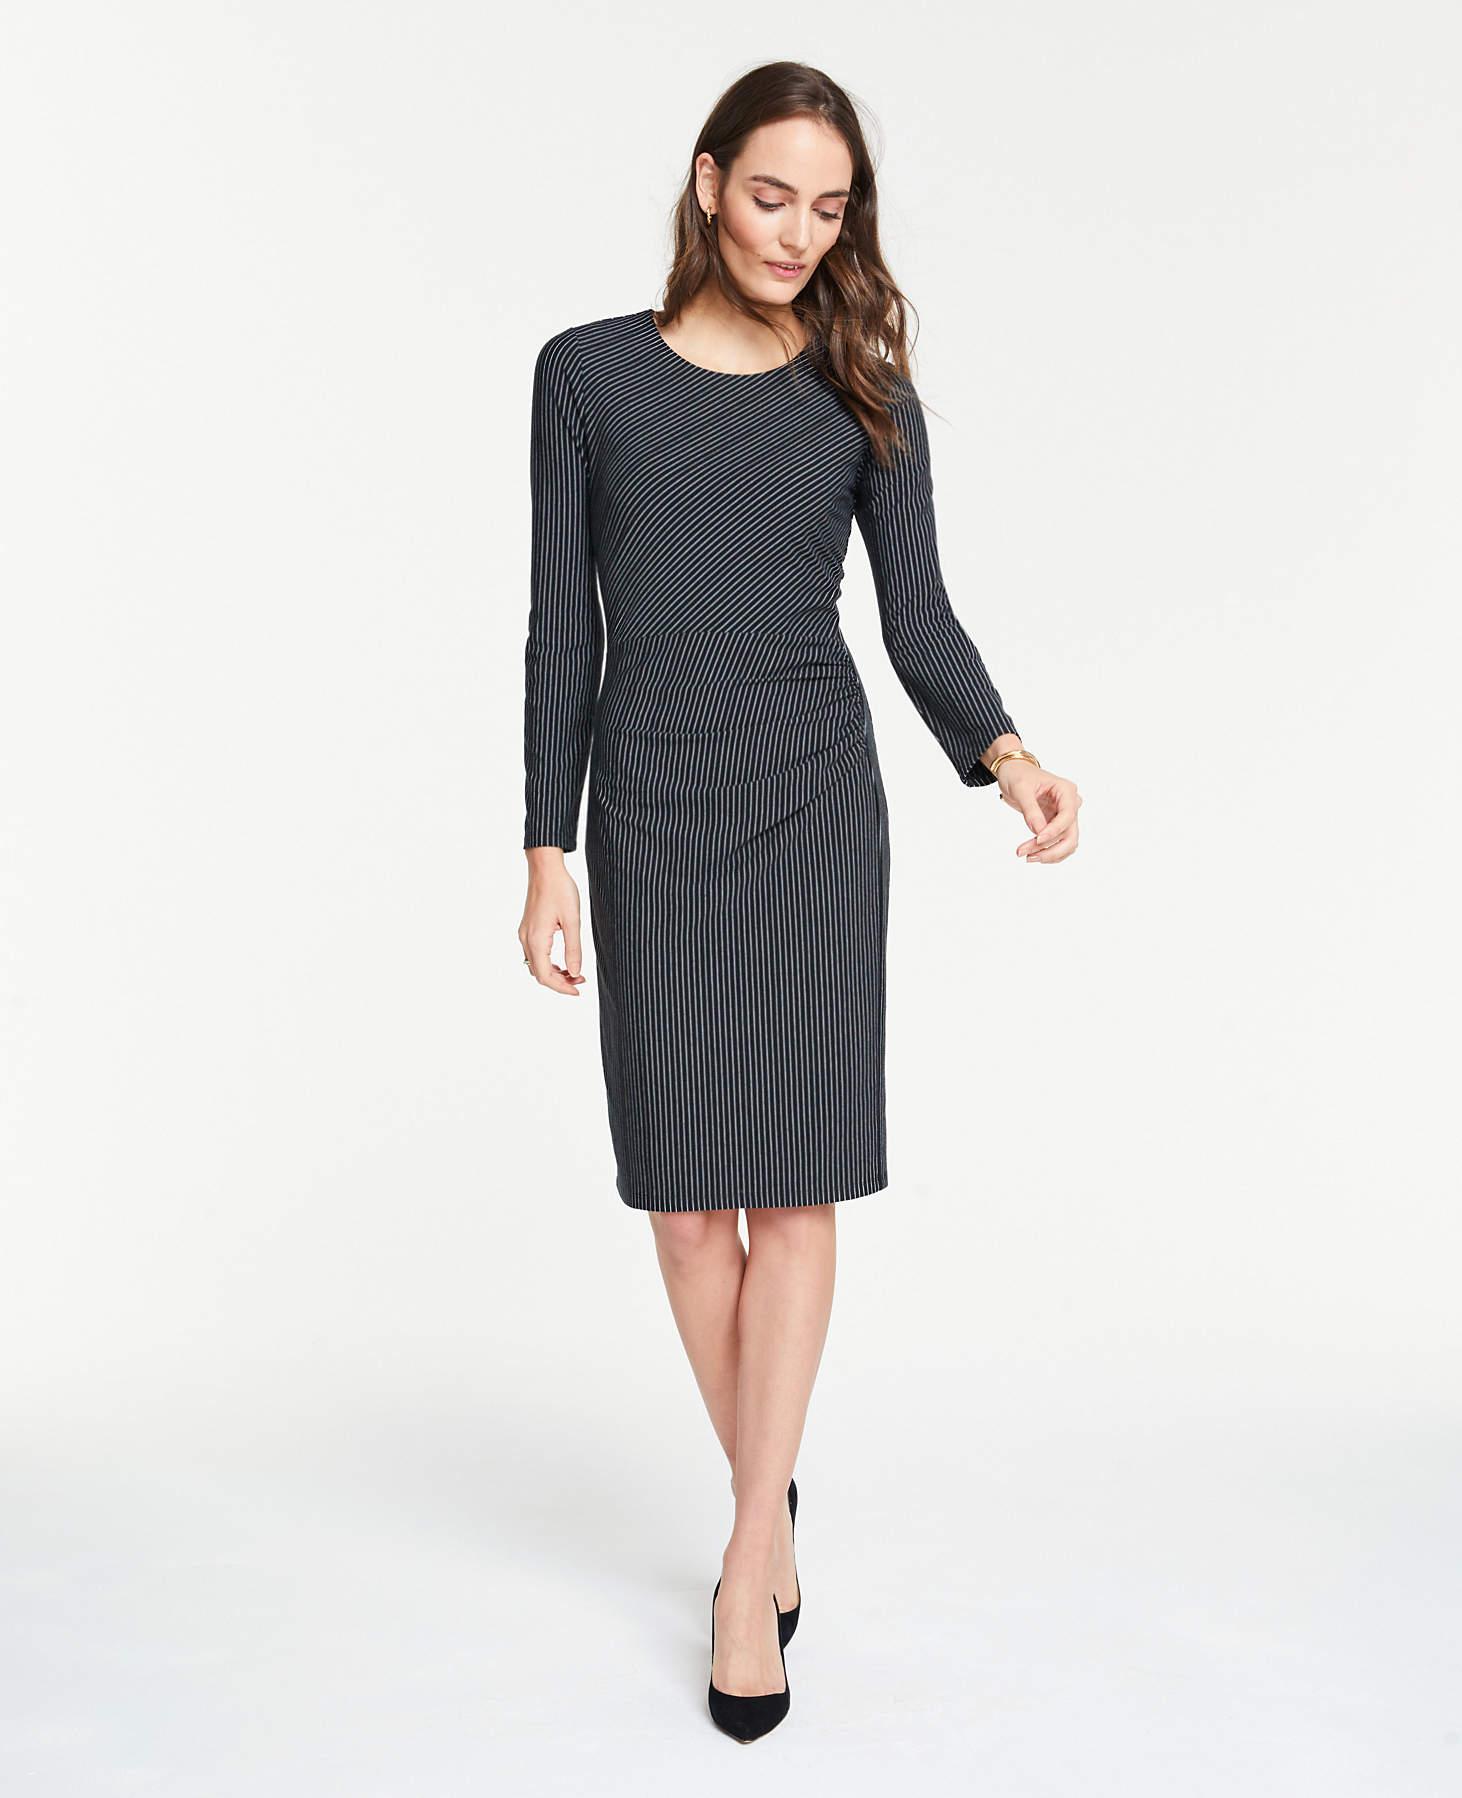 ba06b0aec83 Lyst - Ann Taylor Petite Mixed Pinstripe Knit Sheath Dress in Black